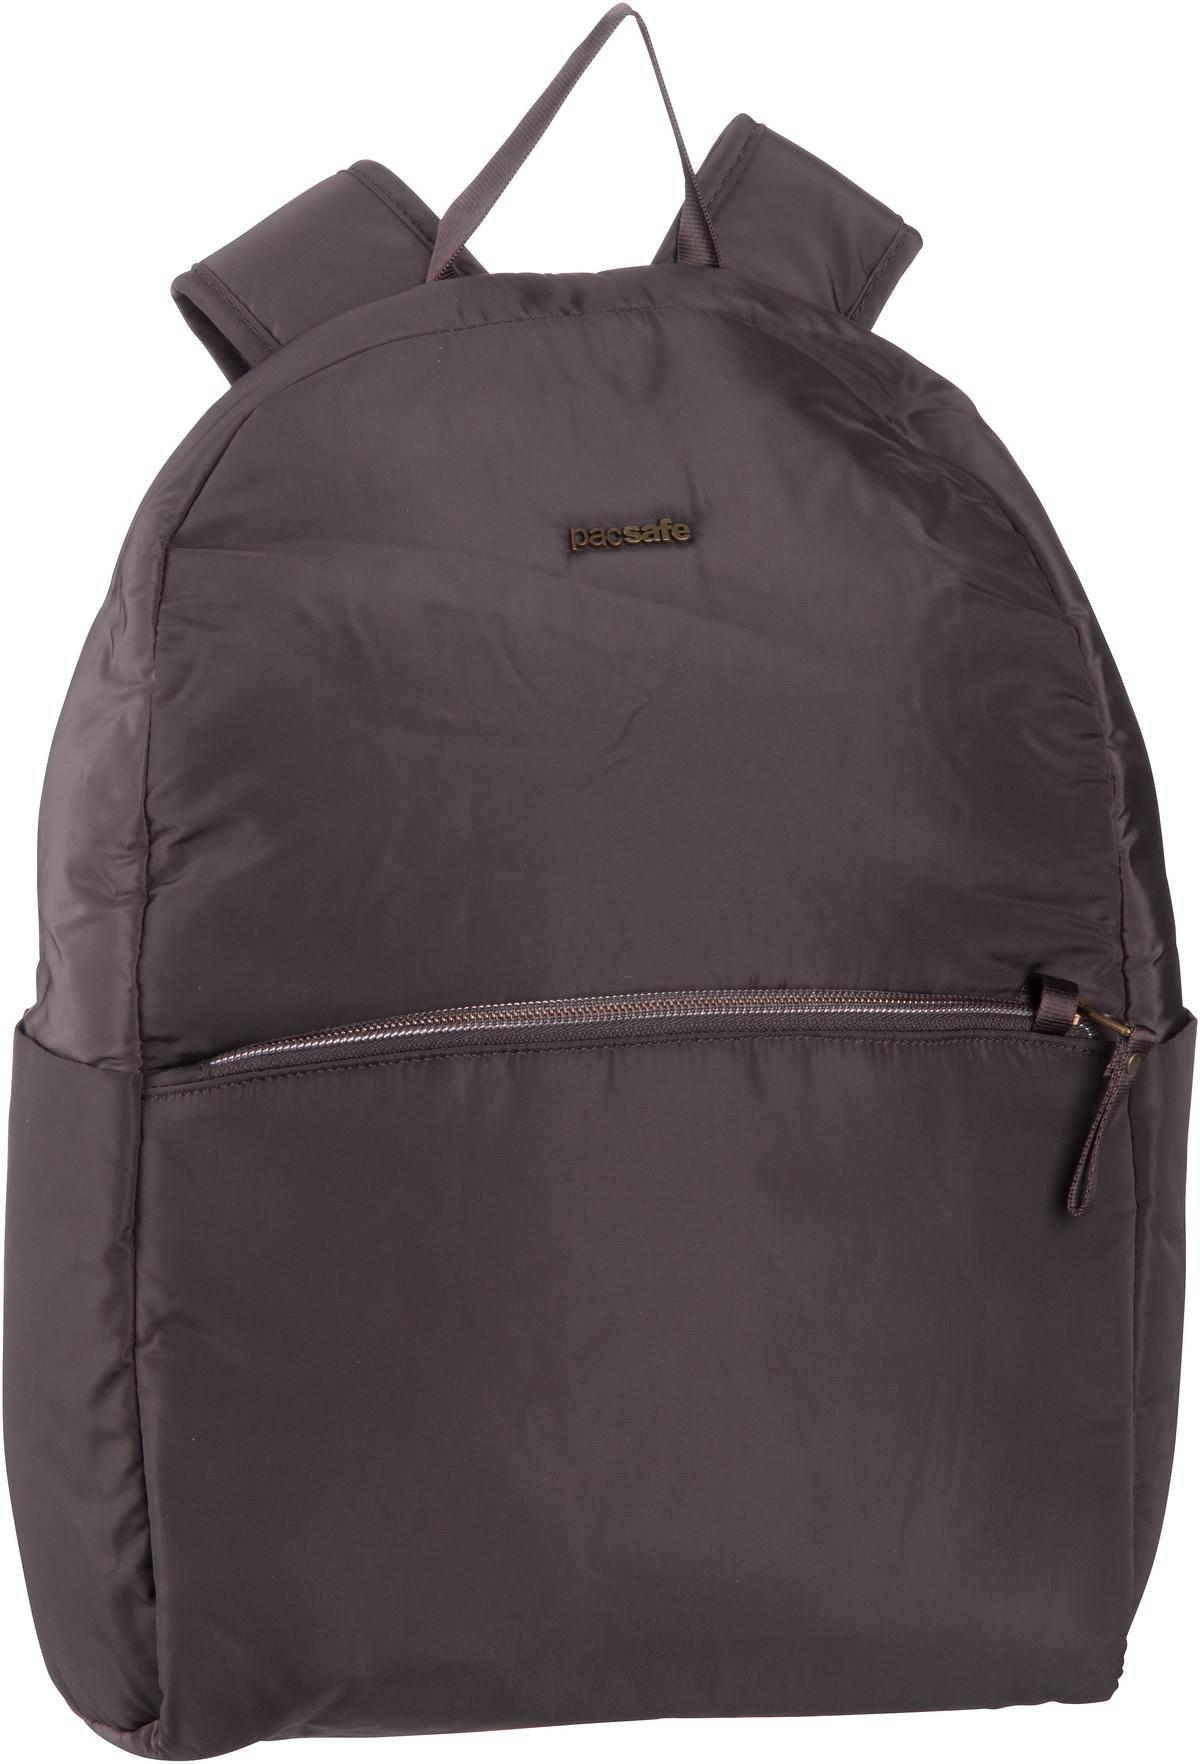 Laptoprucksack Stylesafe Backpack Mocha (12 Liter)